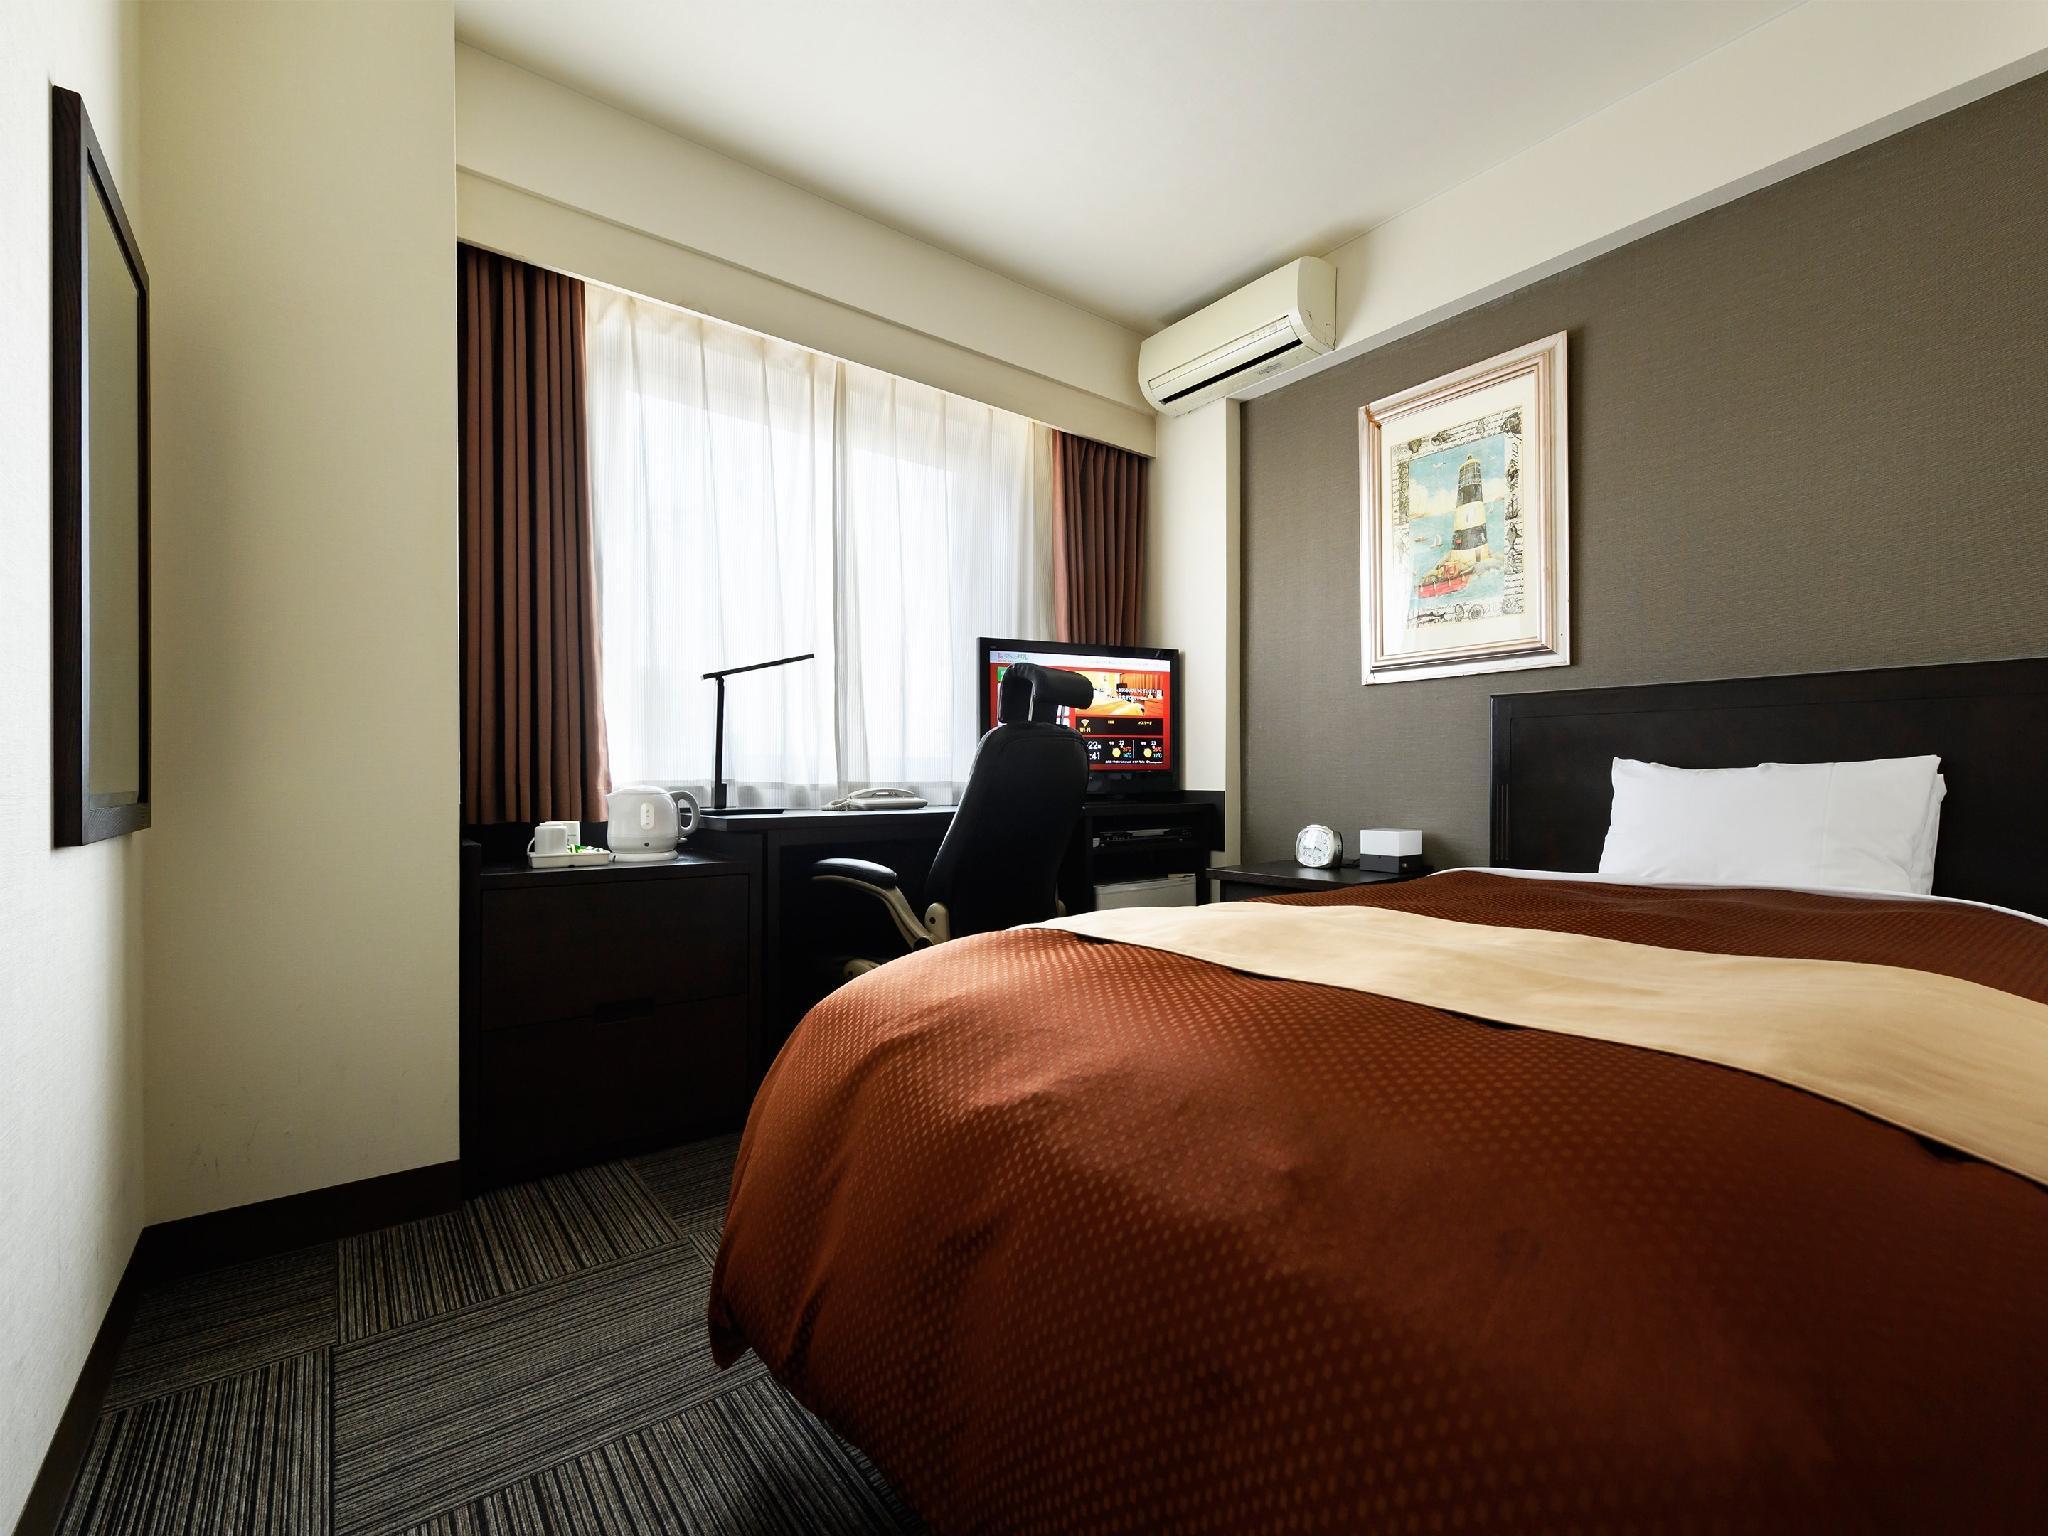 Hotel Sealuck Pal Yaizu, Yaizu